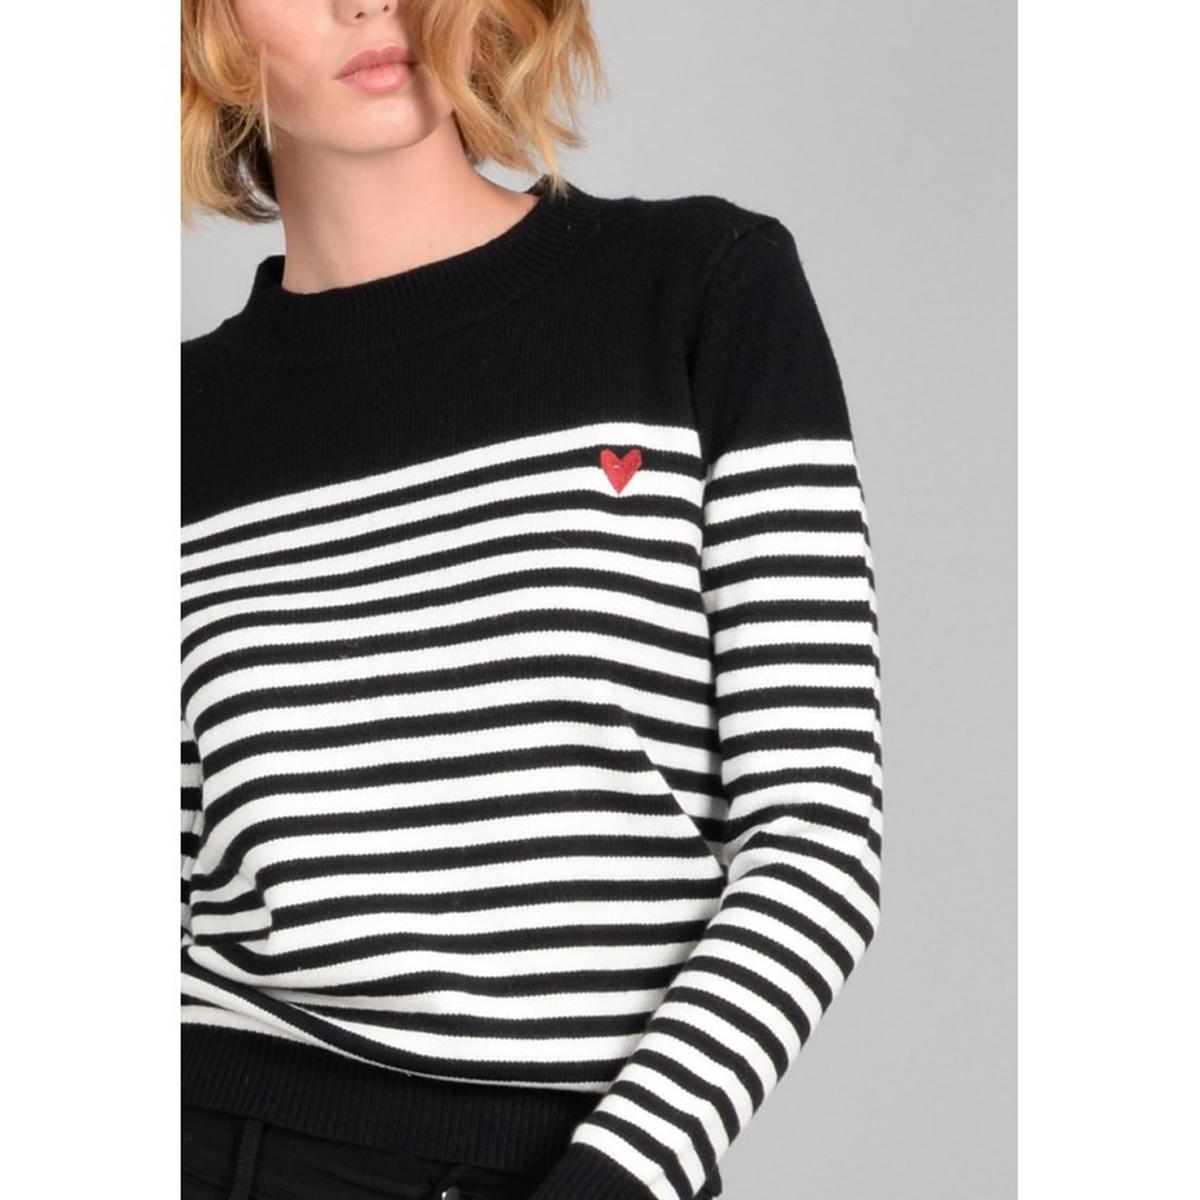 Пуловер MOLLY BRACKEN 10947670 от LaRedoute